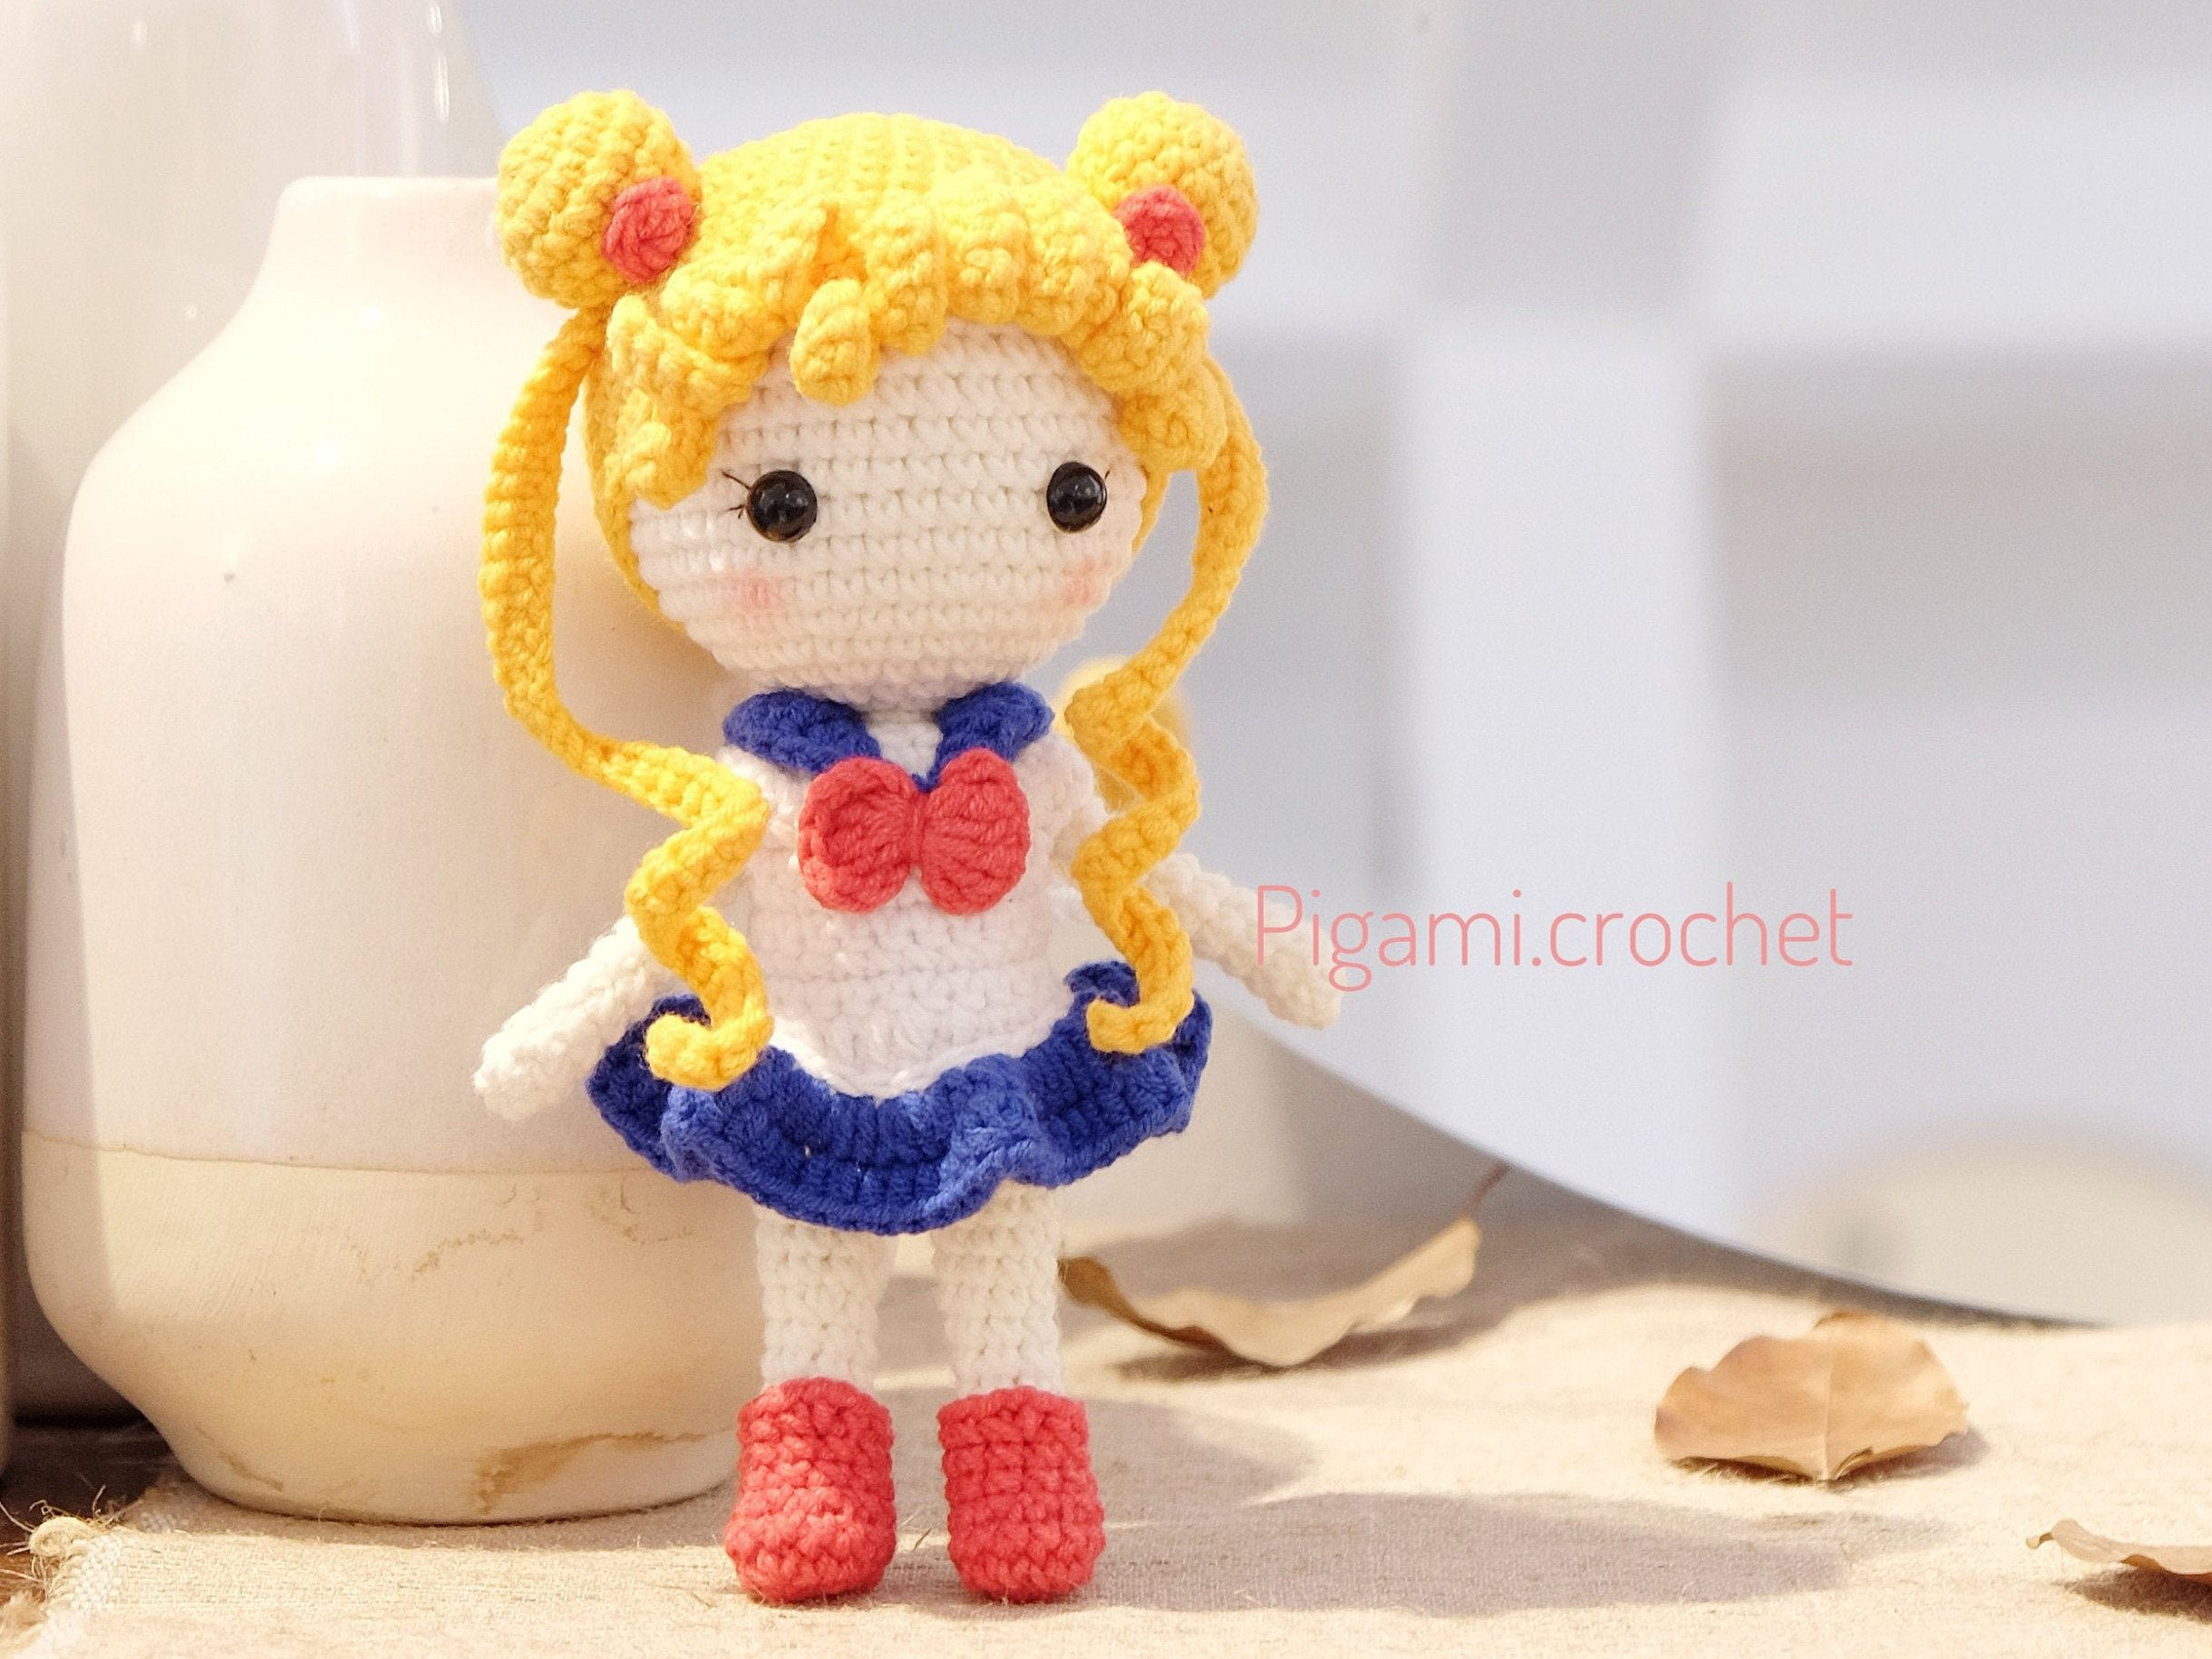 Amazing and very Cute Crochet Amigurumi Pattern Ideas for 2019 ... | 1830x2440